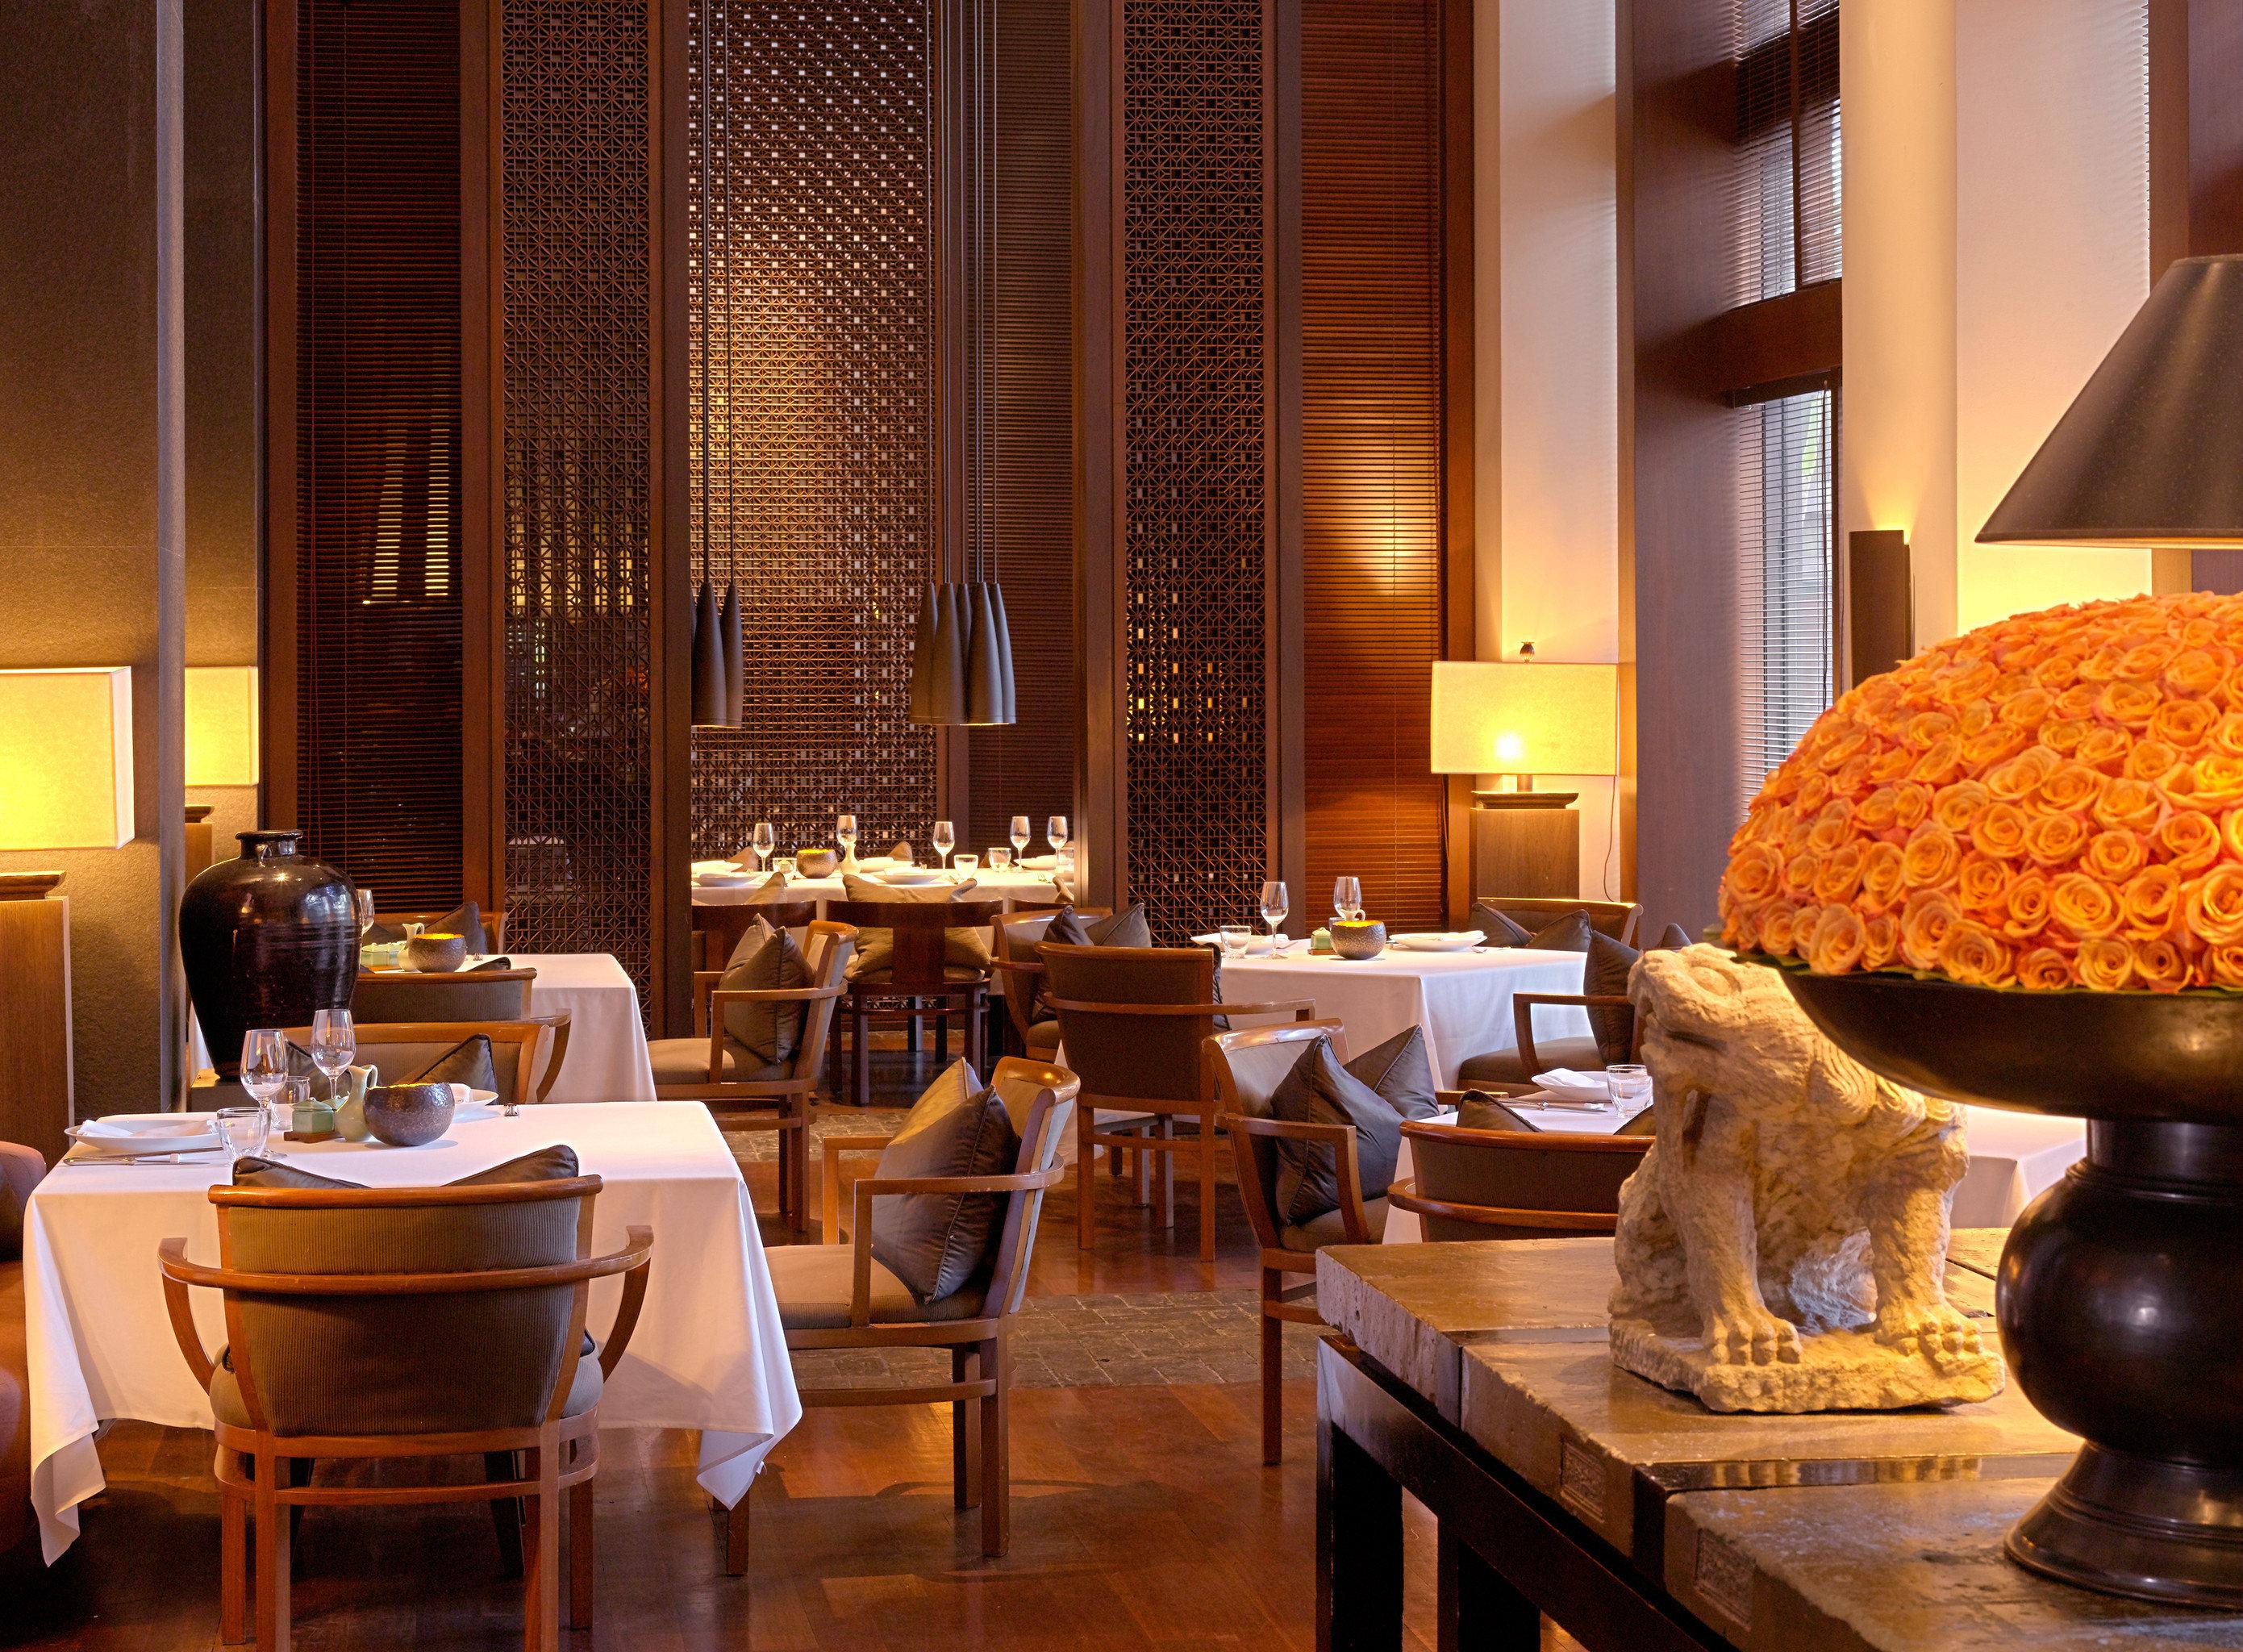 Bar Dining Drink Eat Elegant restaurant Lobby lighting café